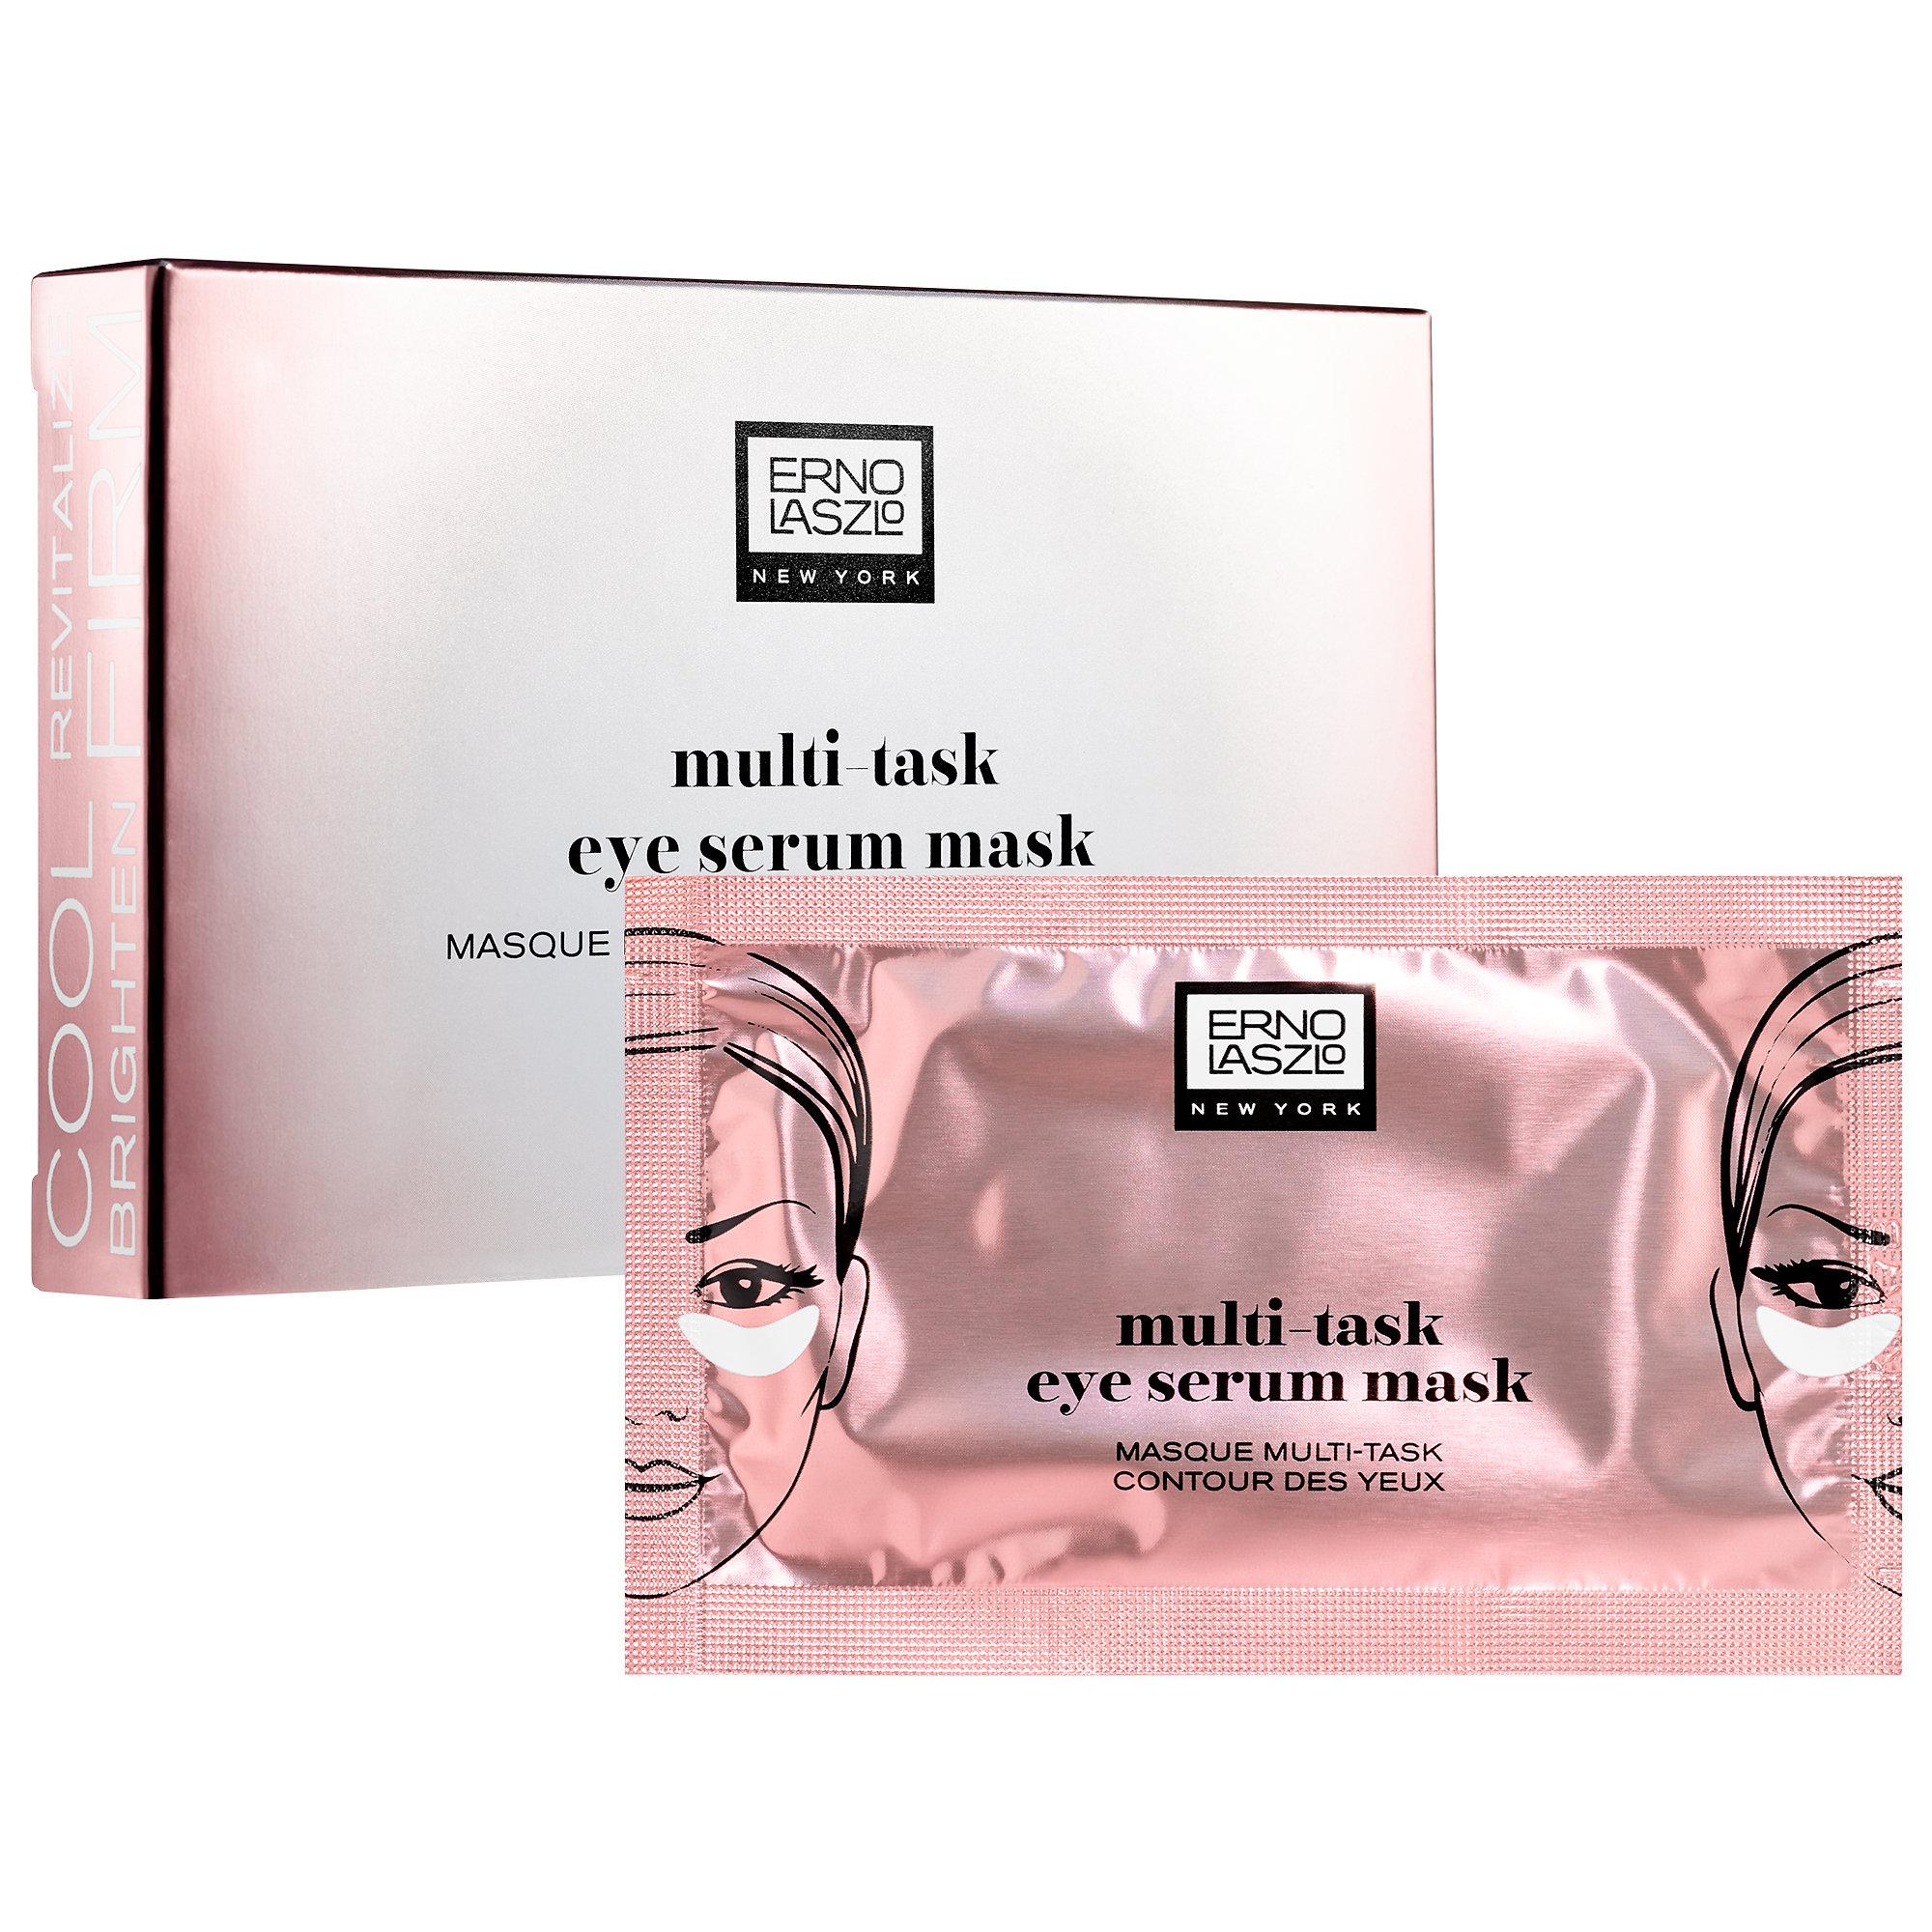 Sephora - Multi-Task Eye Serum Mask - Erno Laszlo | Sephora